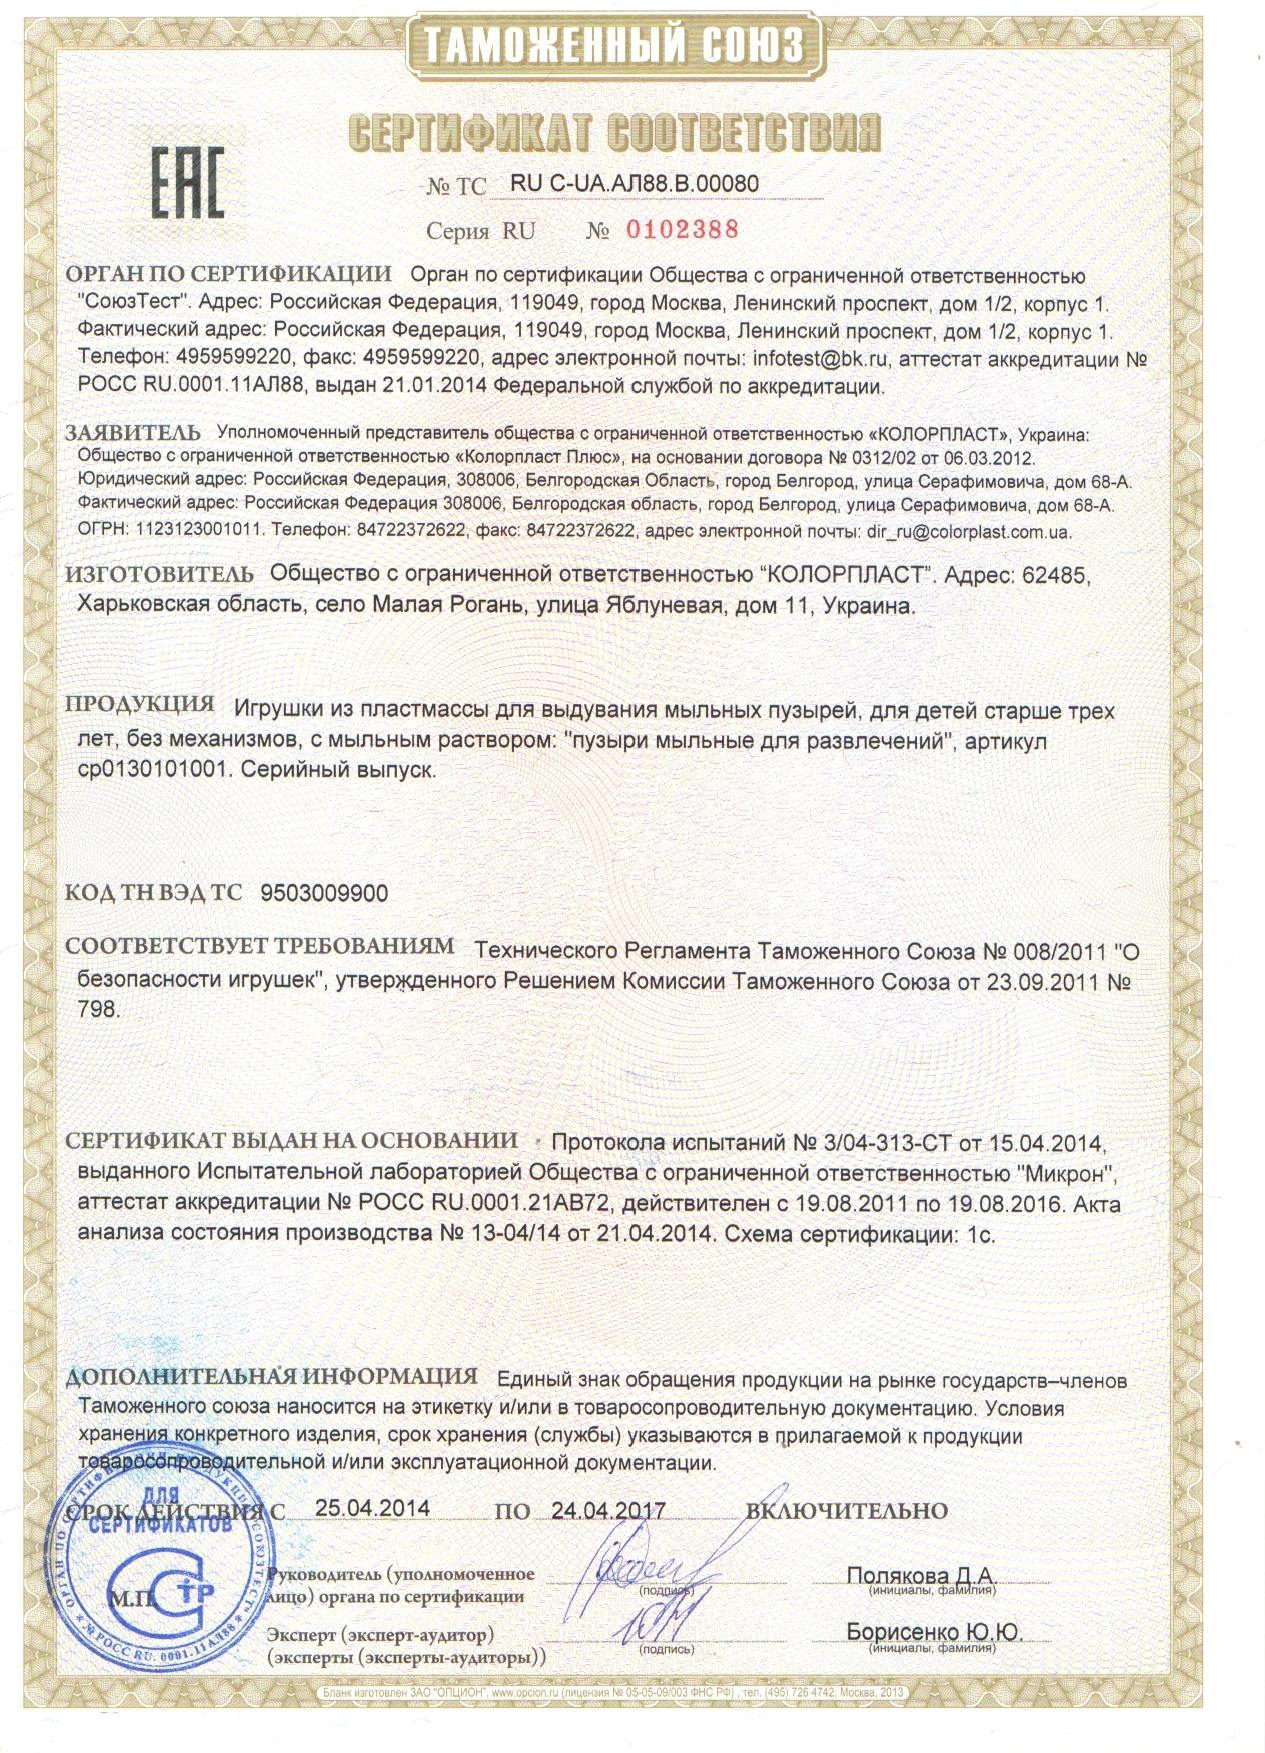 сертификация таможенного союза